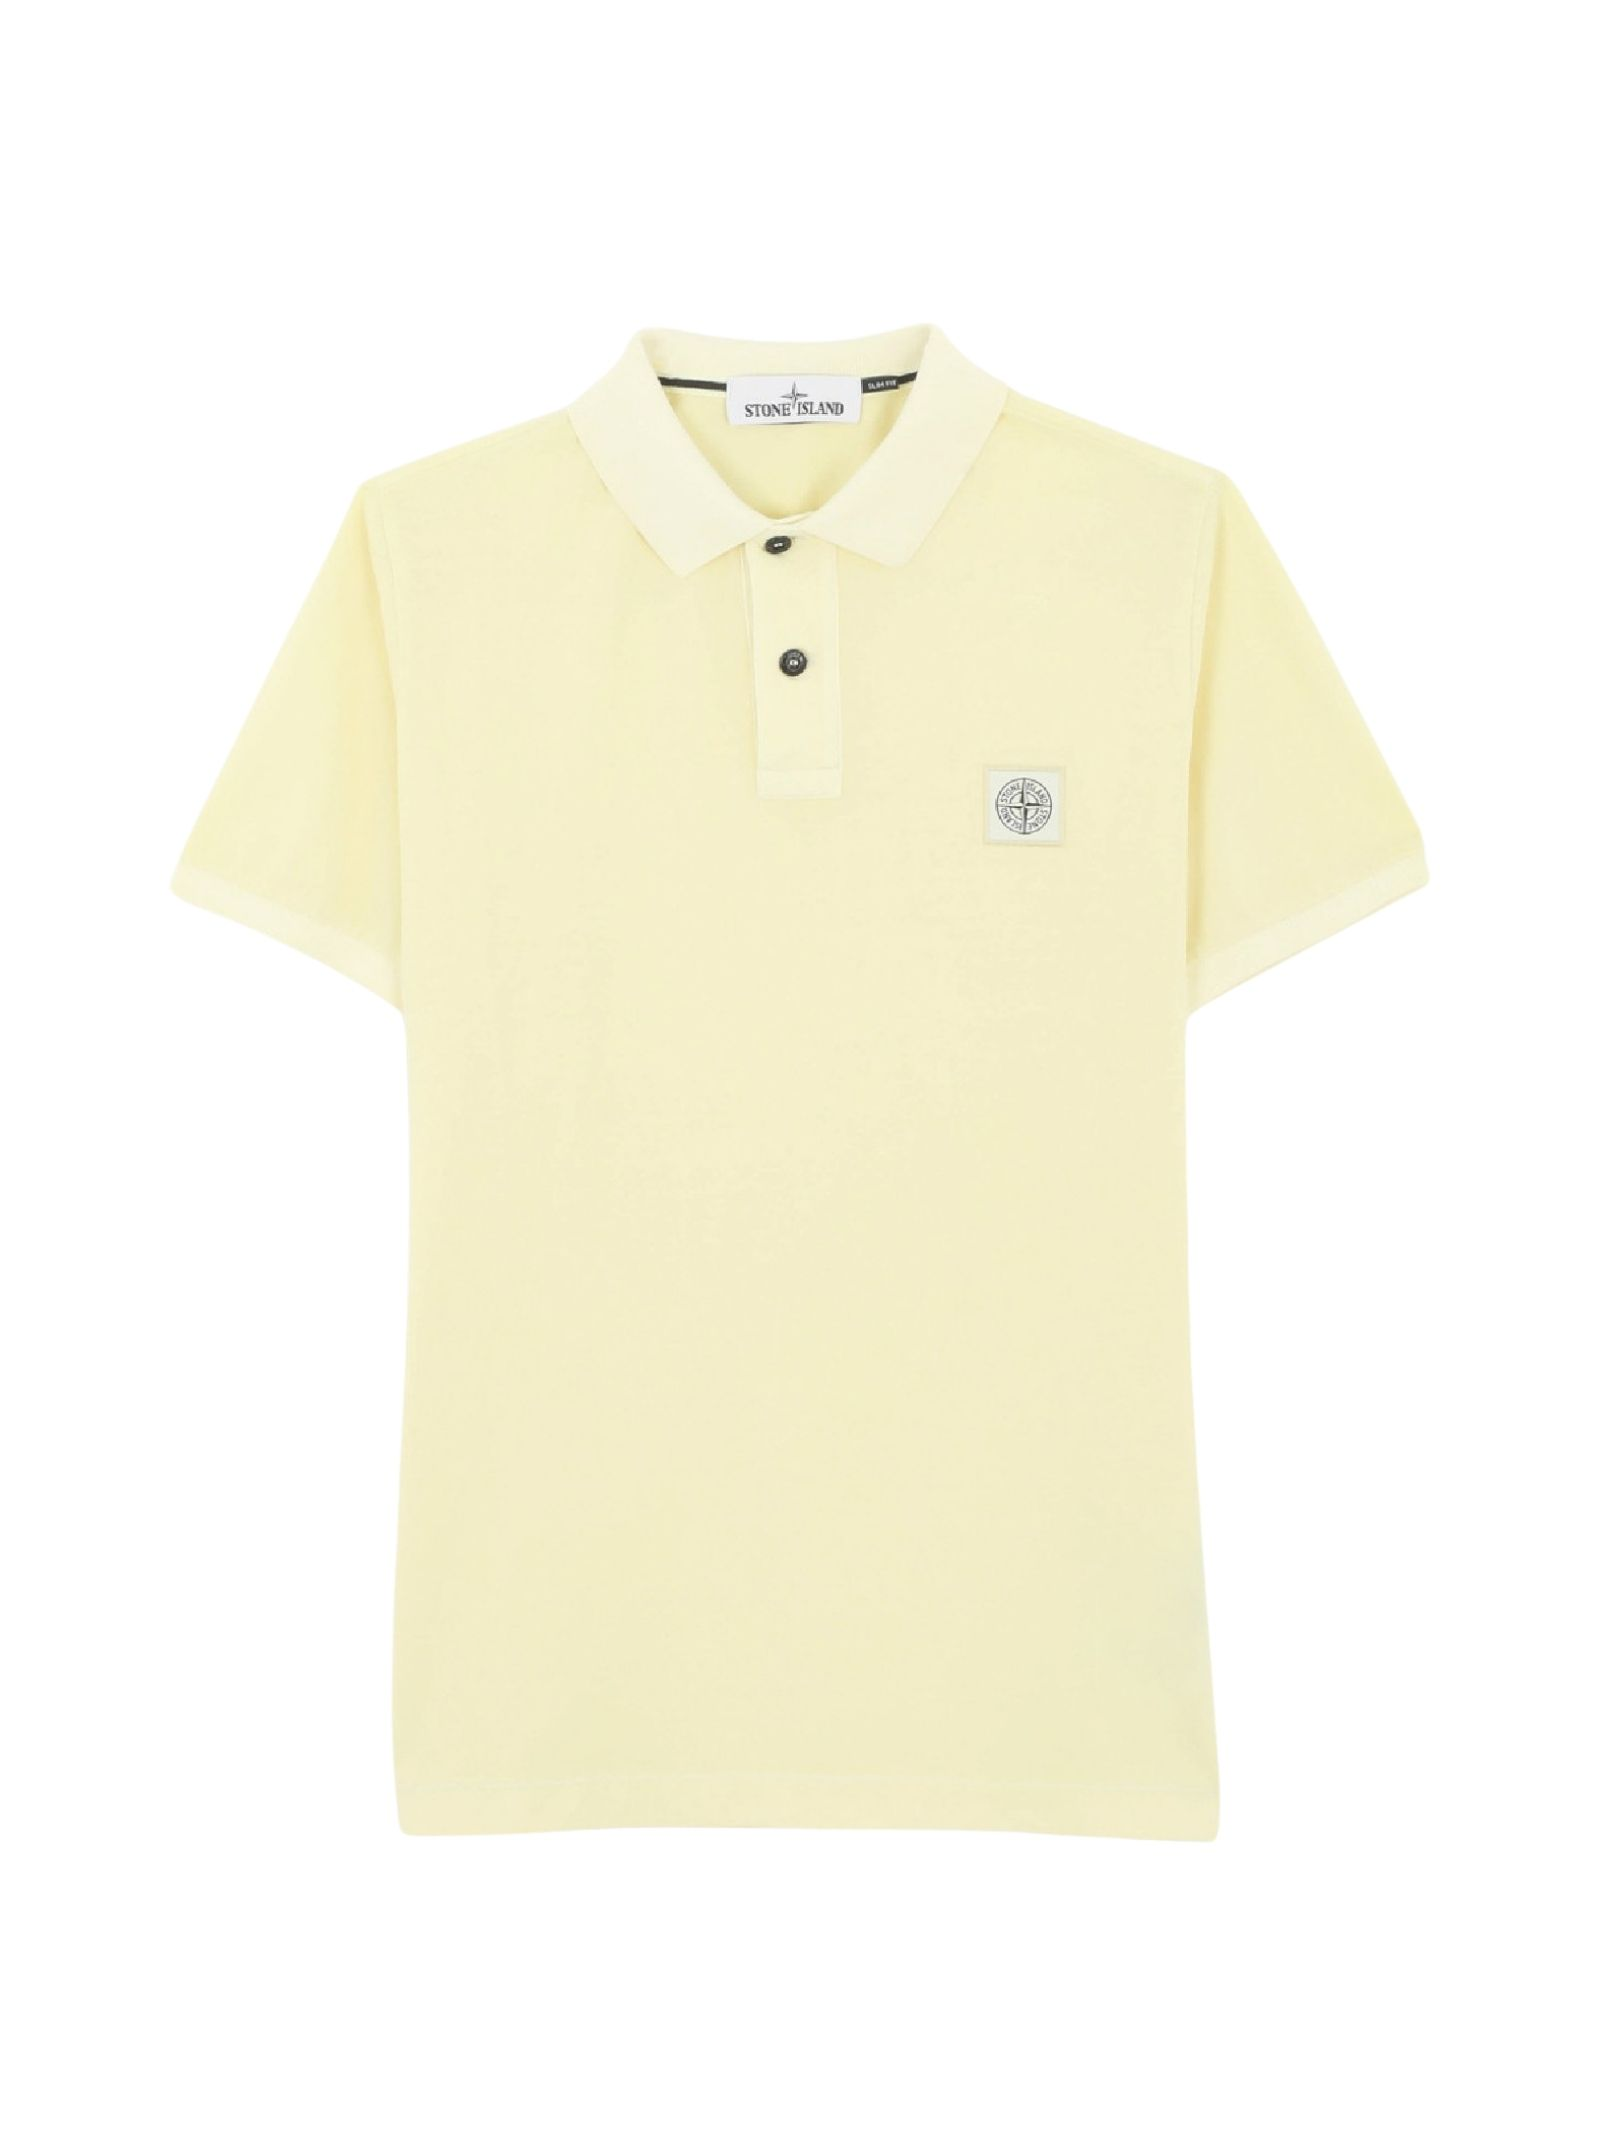 T-shirt girocollo STONE ISLAND | T-shirt | MO741522S67V0051